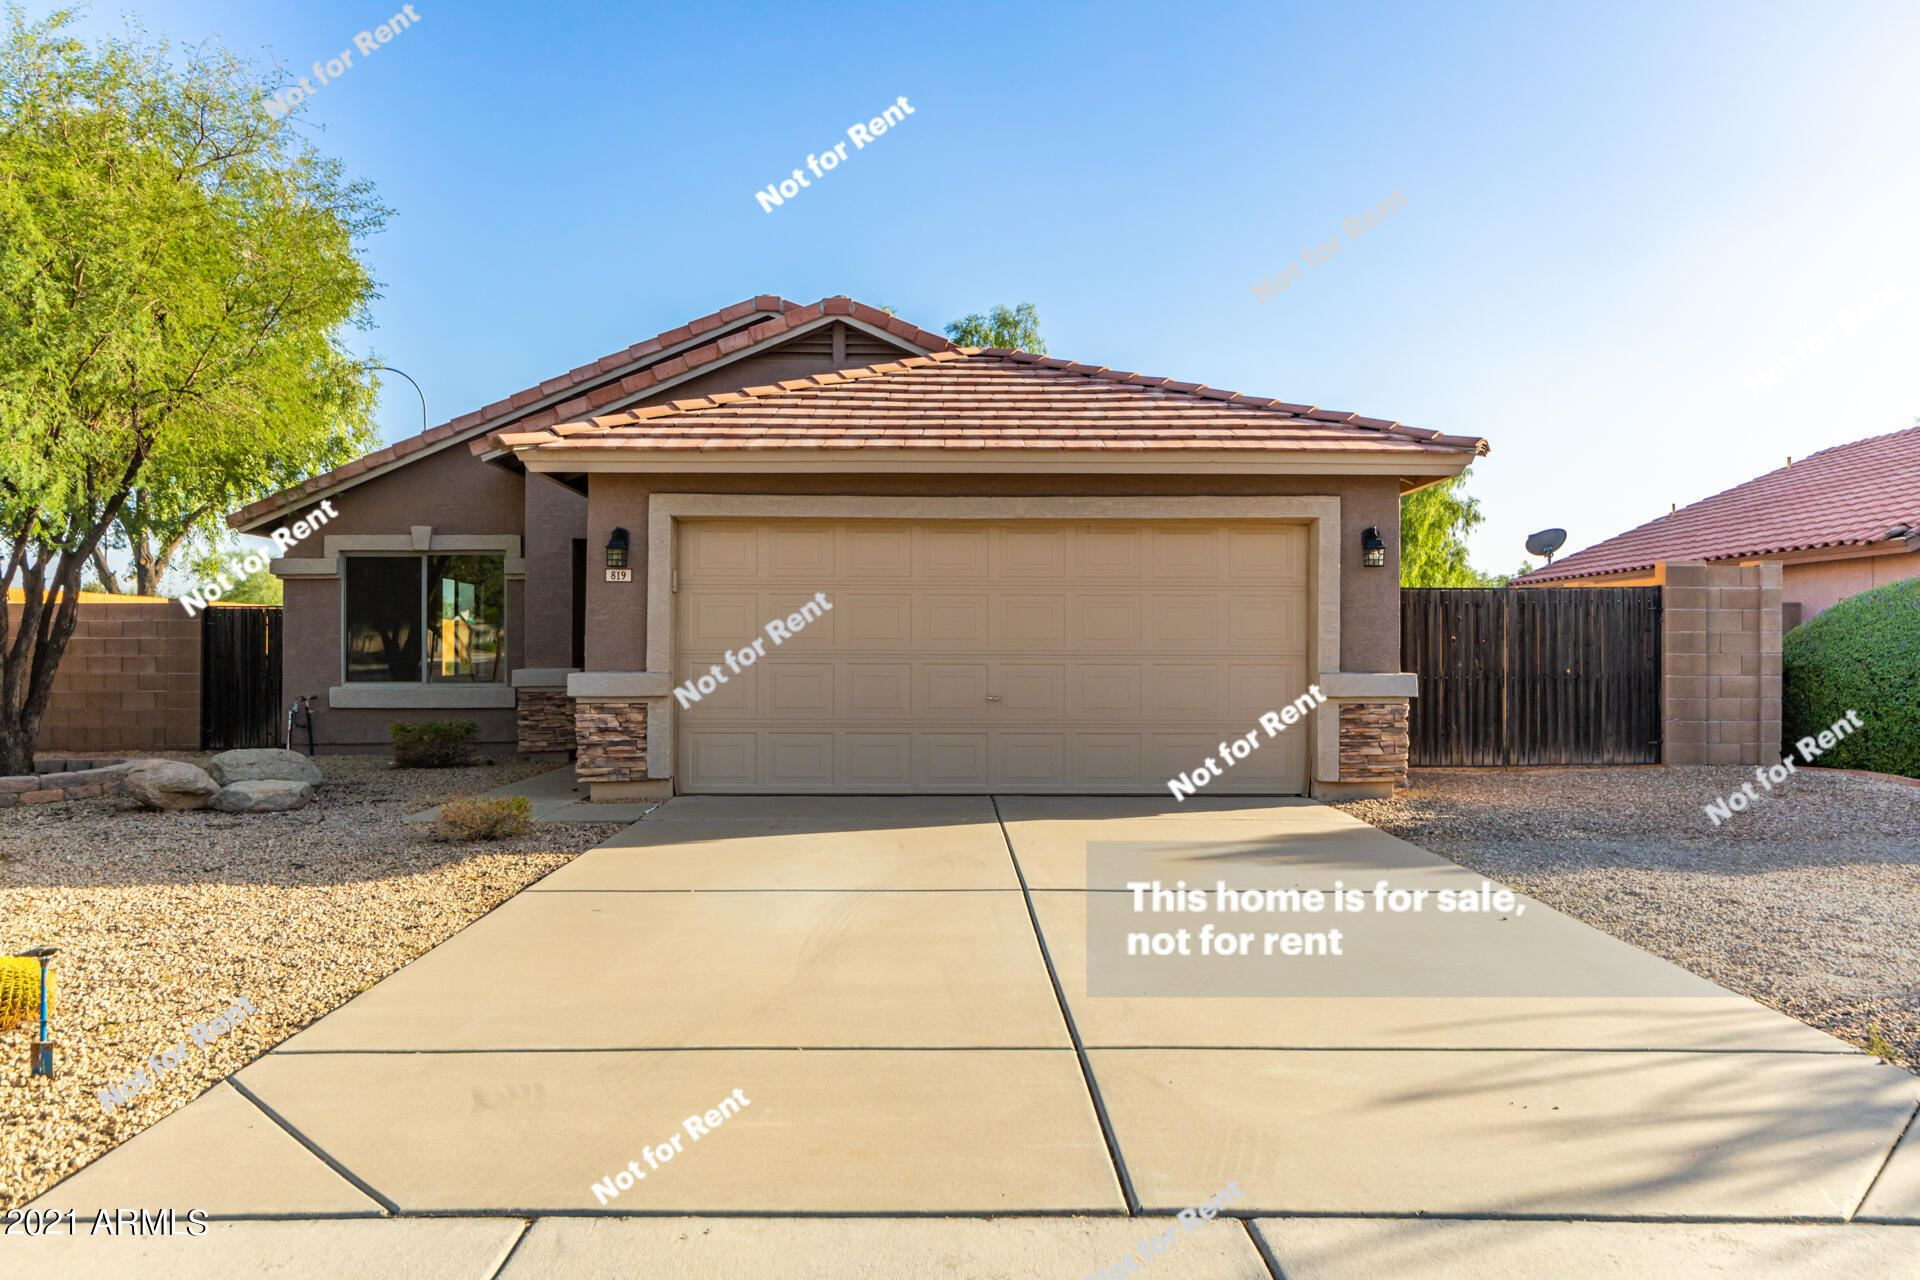 Photo of 819 W 10TH Avenue, Apache Junction, AZ 85120 (MLS # 6306536)